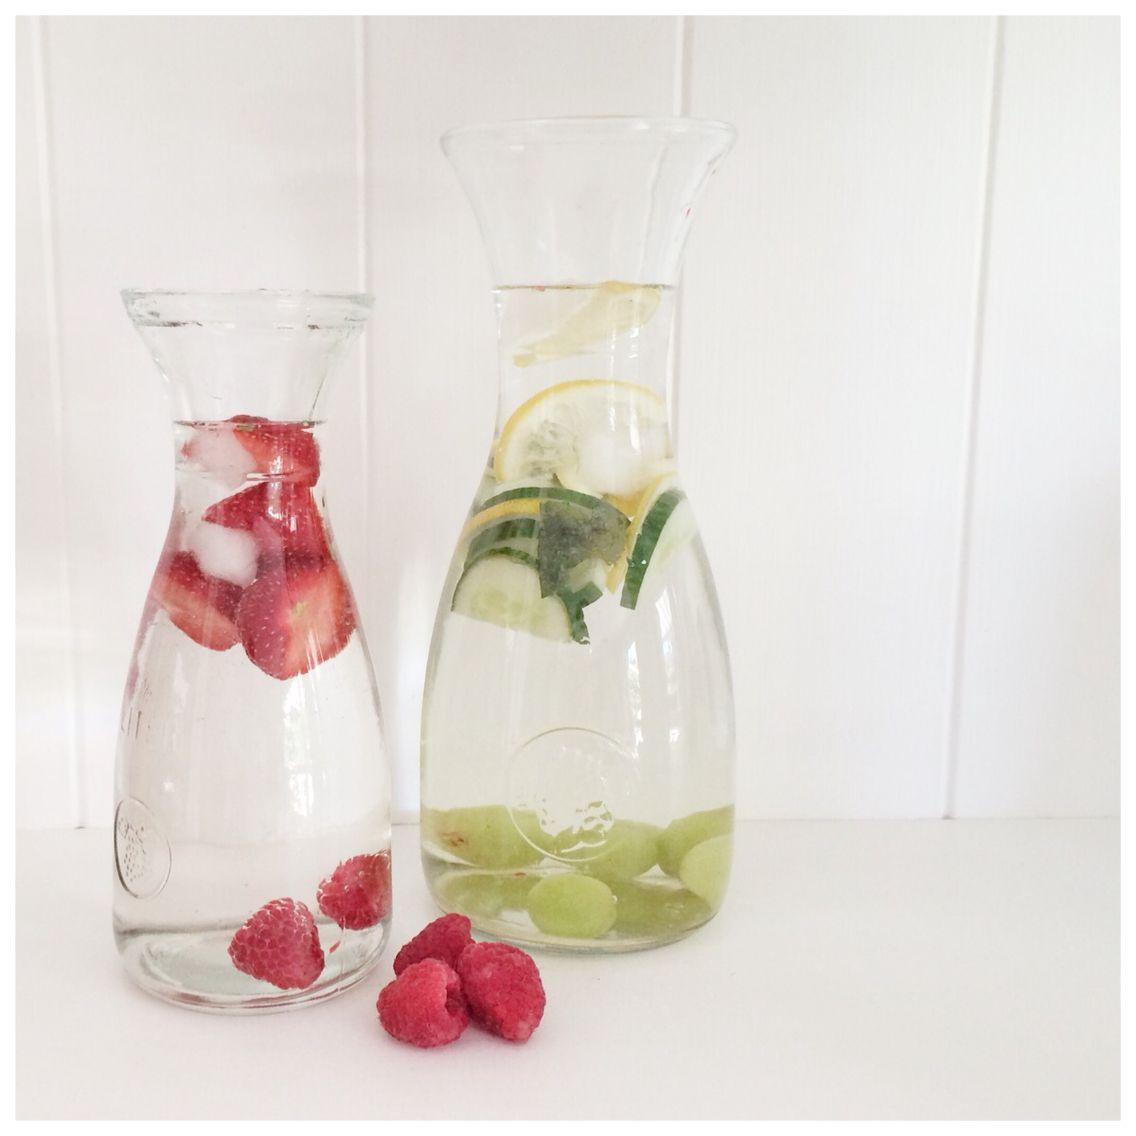 Heerlijk fris zomers drankje. Fruitwater. www.janetdevilee.blogspot.nl